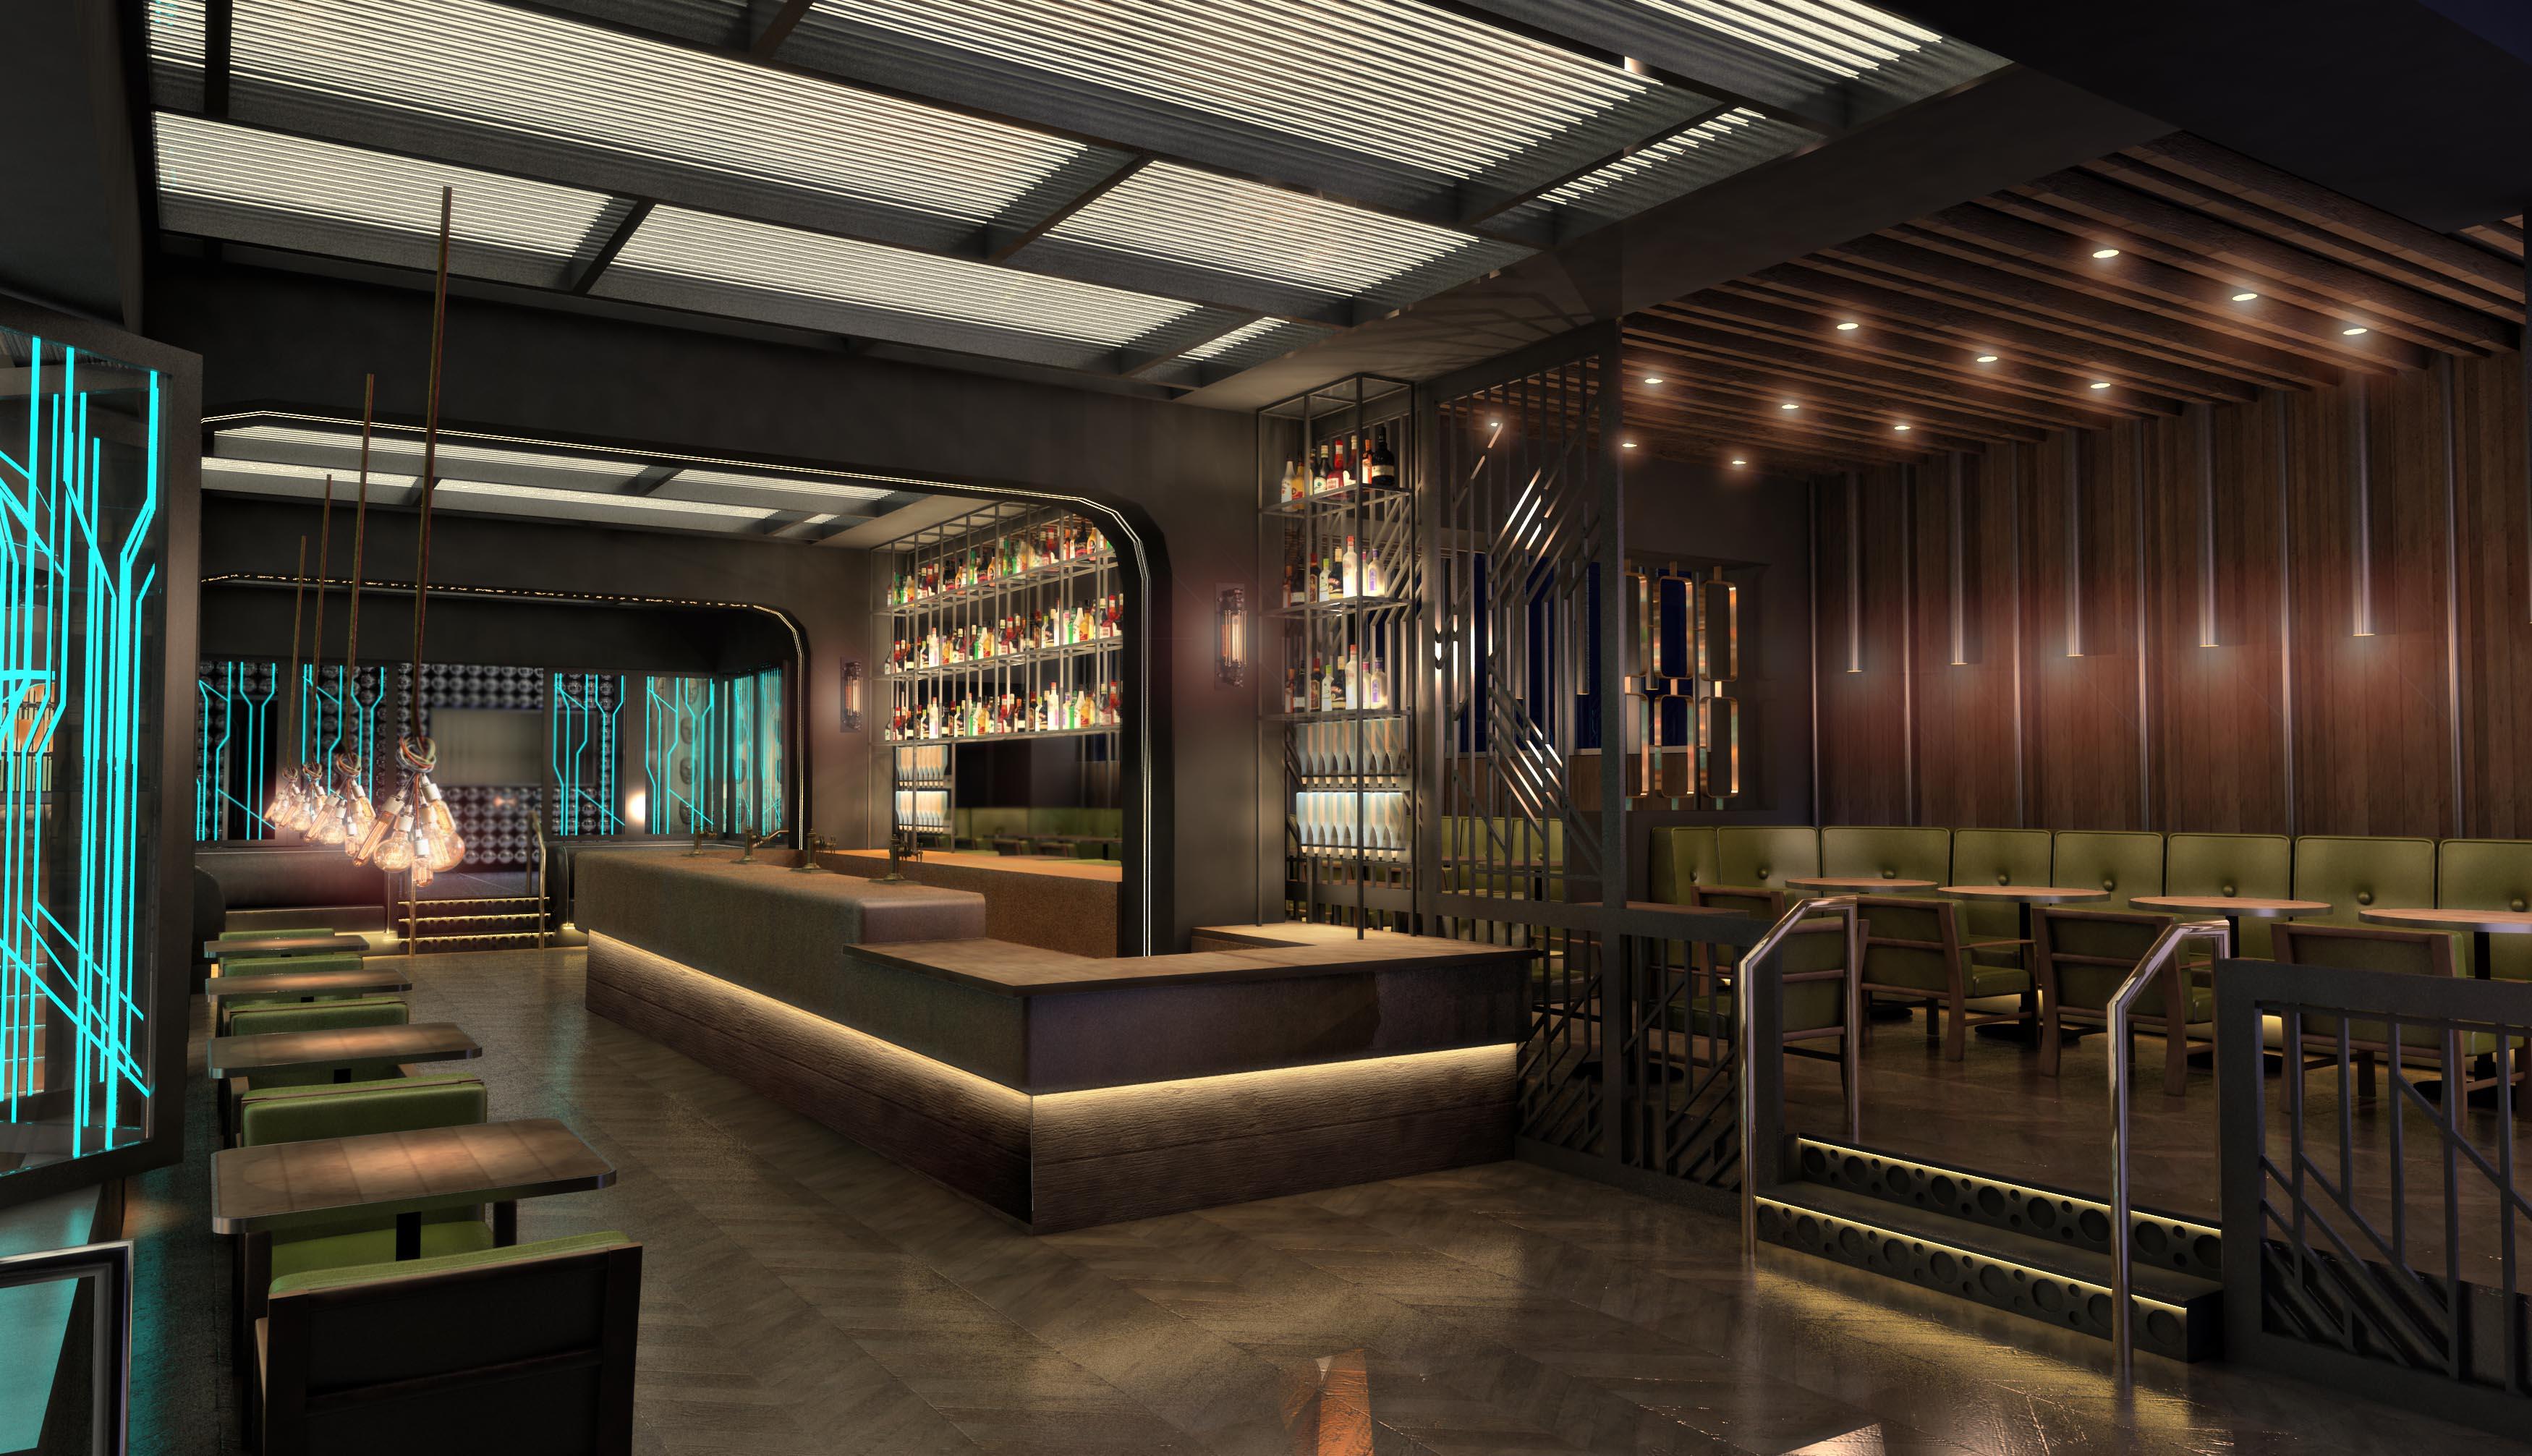 Award Winning Interior Designers for Restaurants Bars Clubs